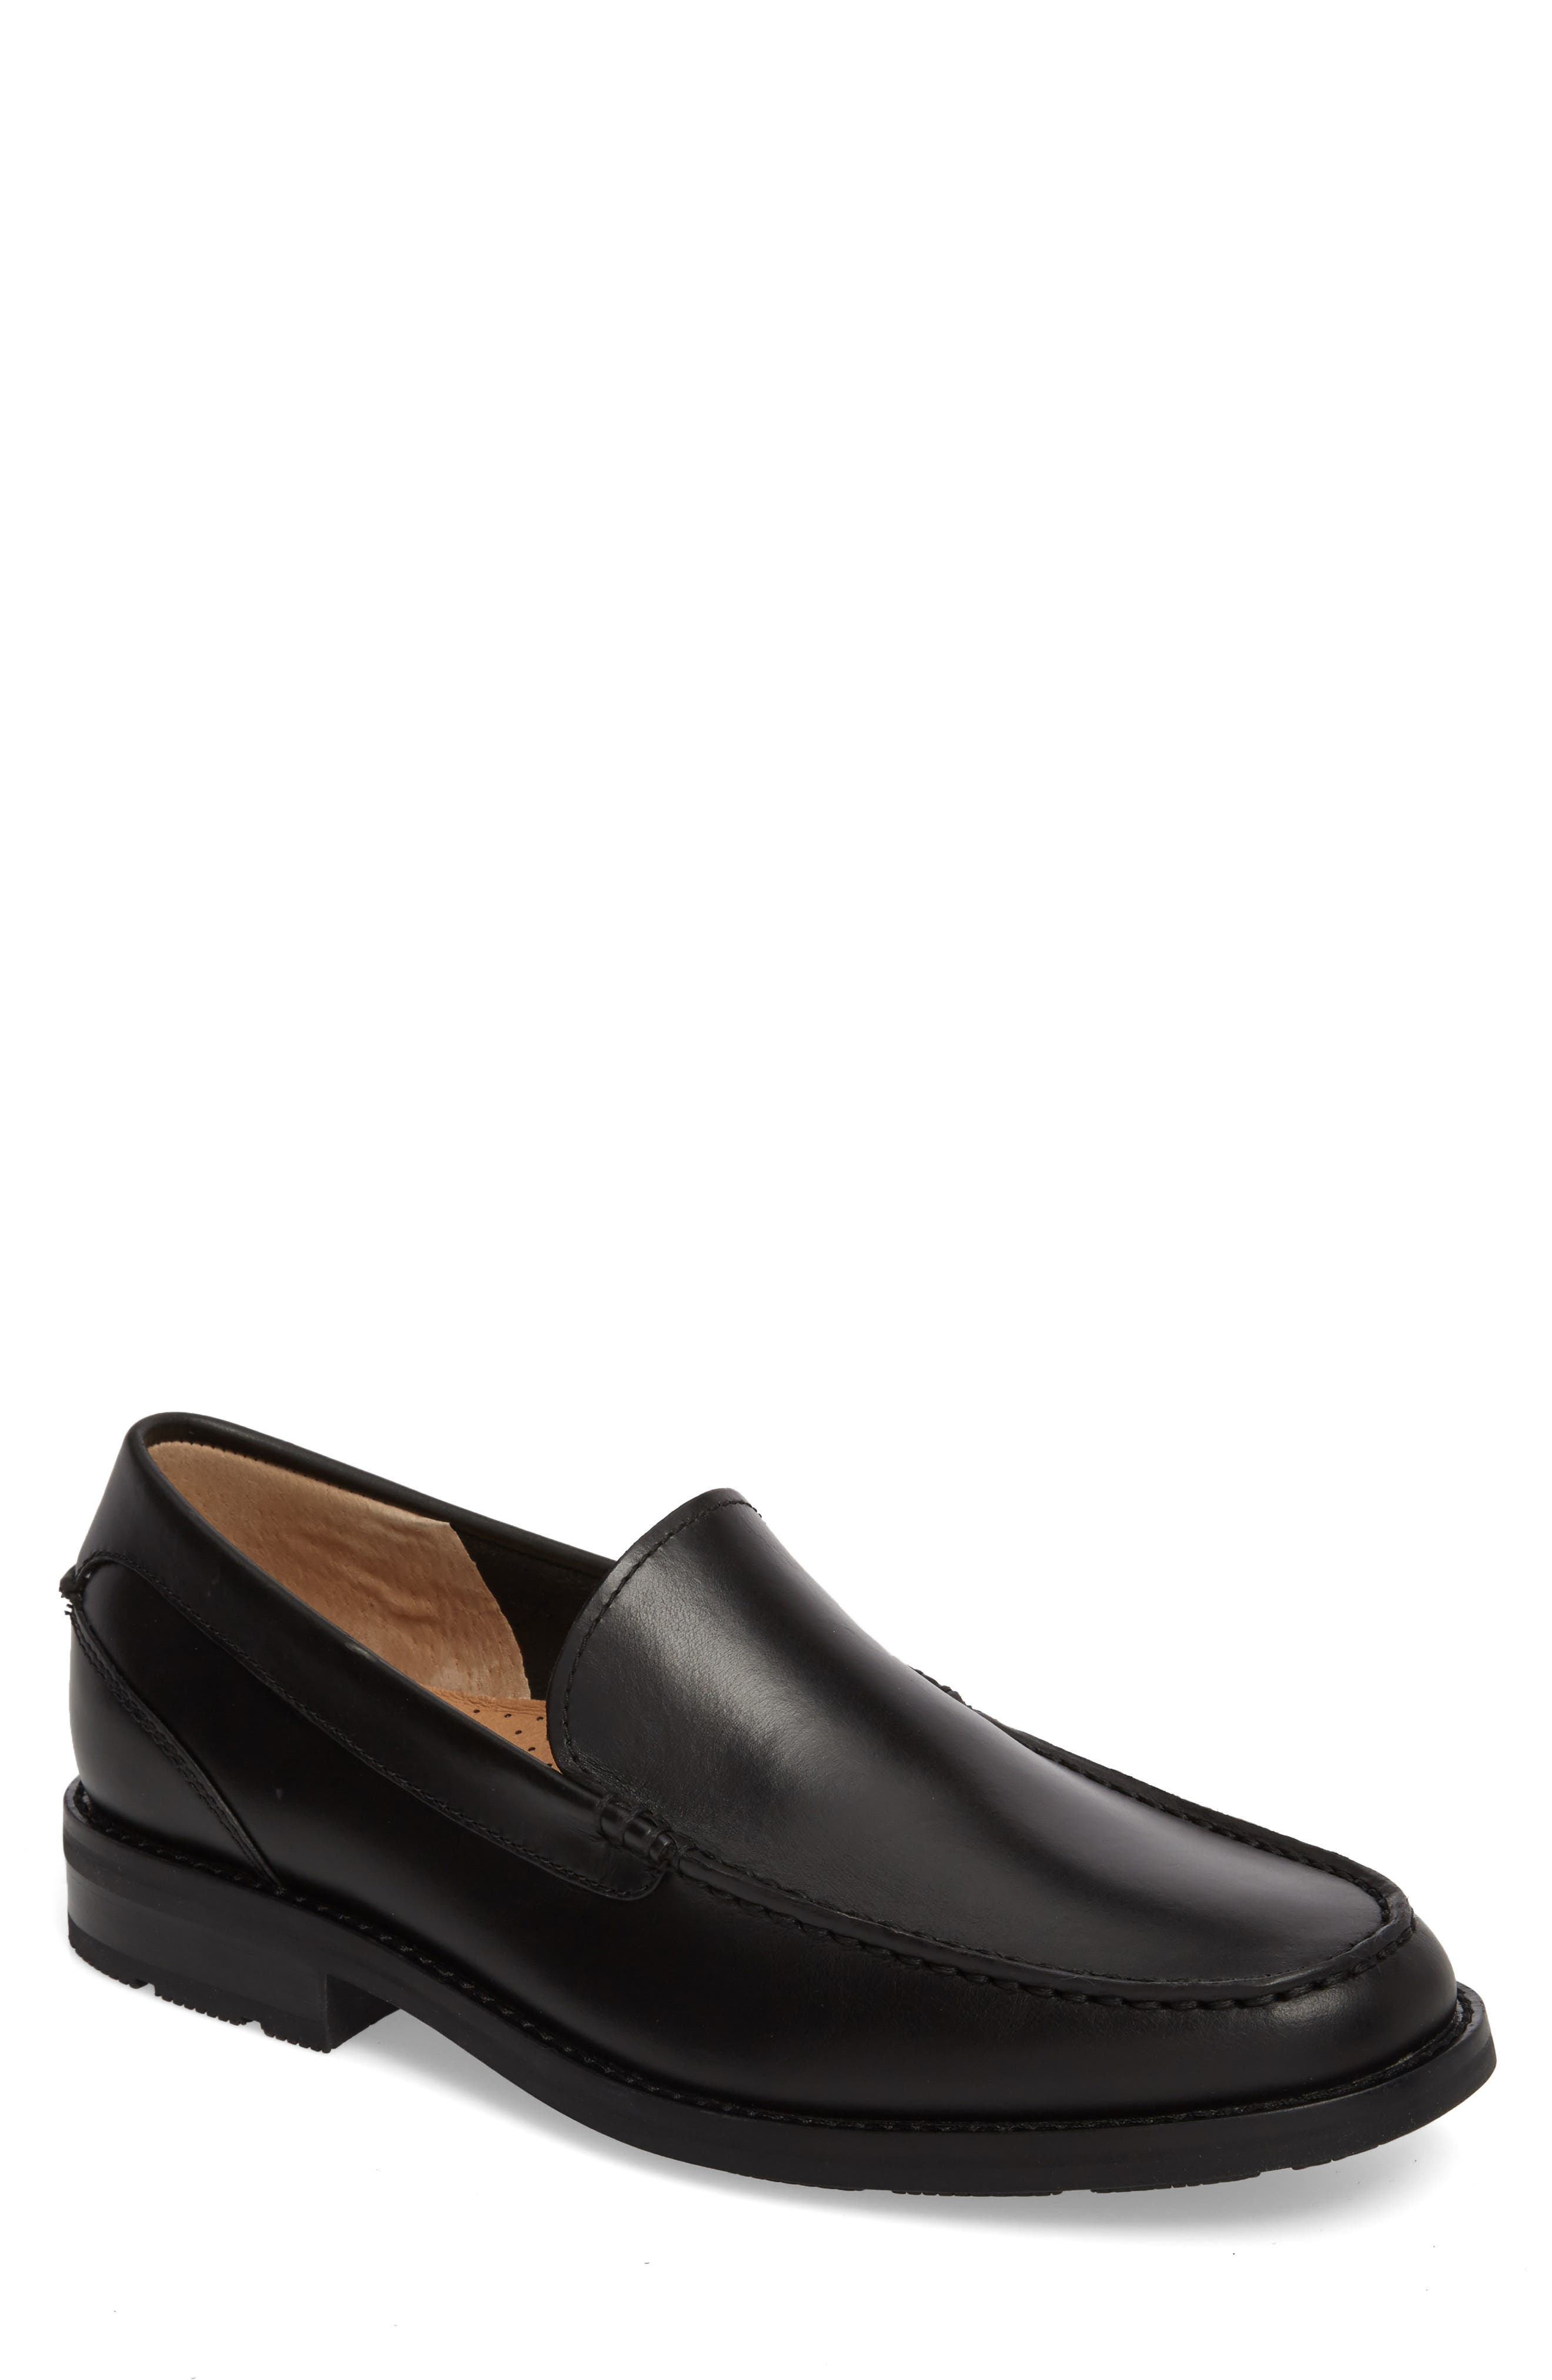 Essex Venetian Loafer,                             Main thumbnail 1, color,                             Black Leather